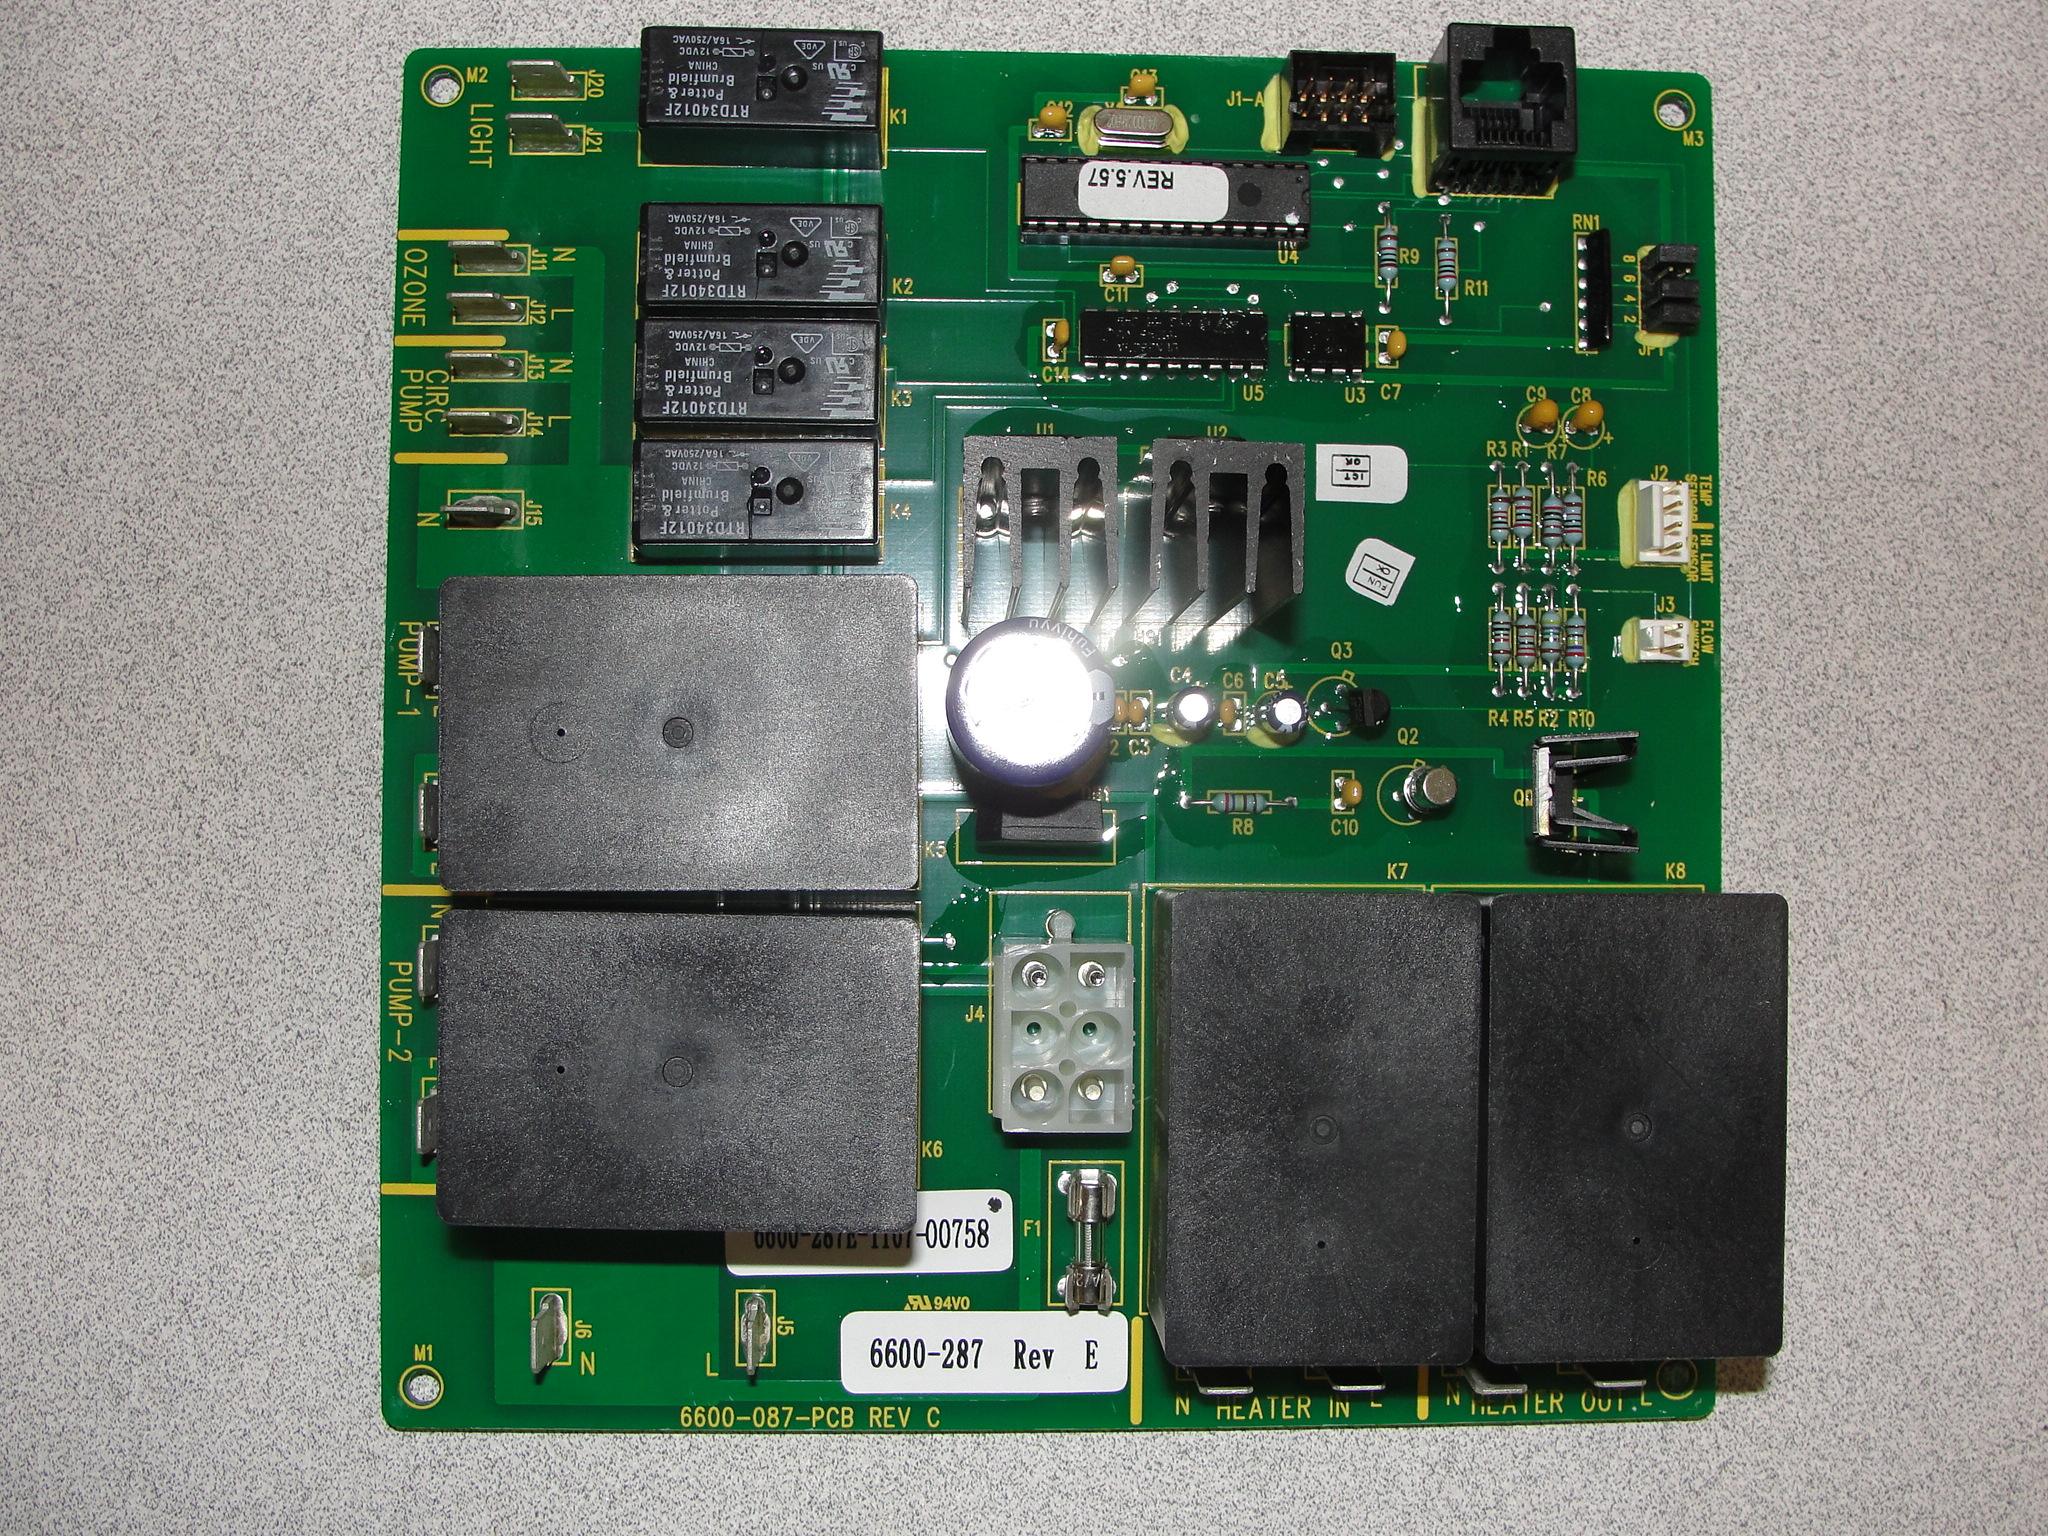 Sundance Spa Circuit Board Wiring Diagrams Diagram 6600 287 A 1 Control Rebuilt Boards Cameo Parts